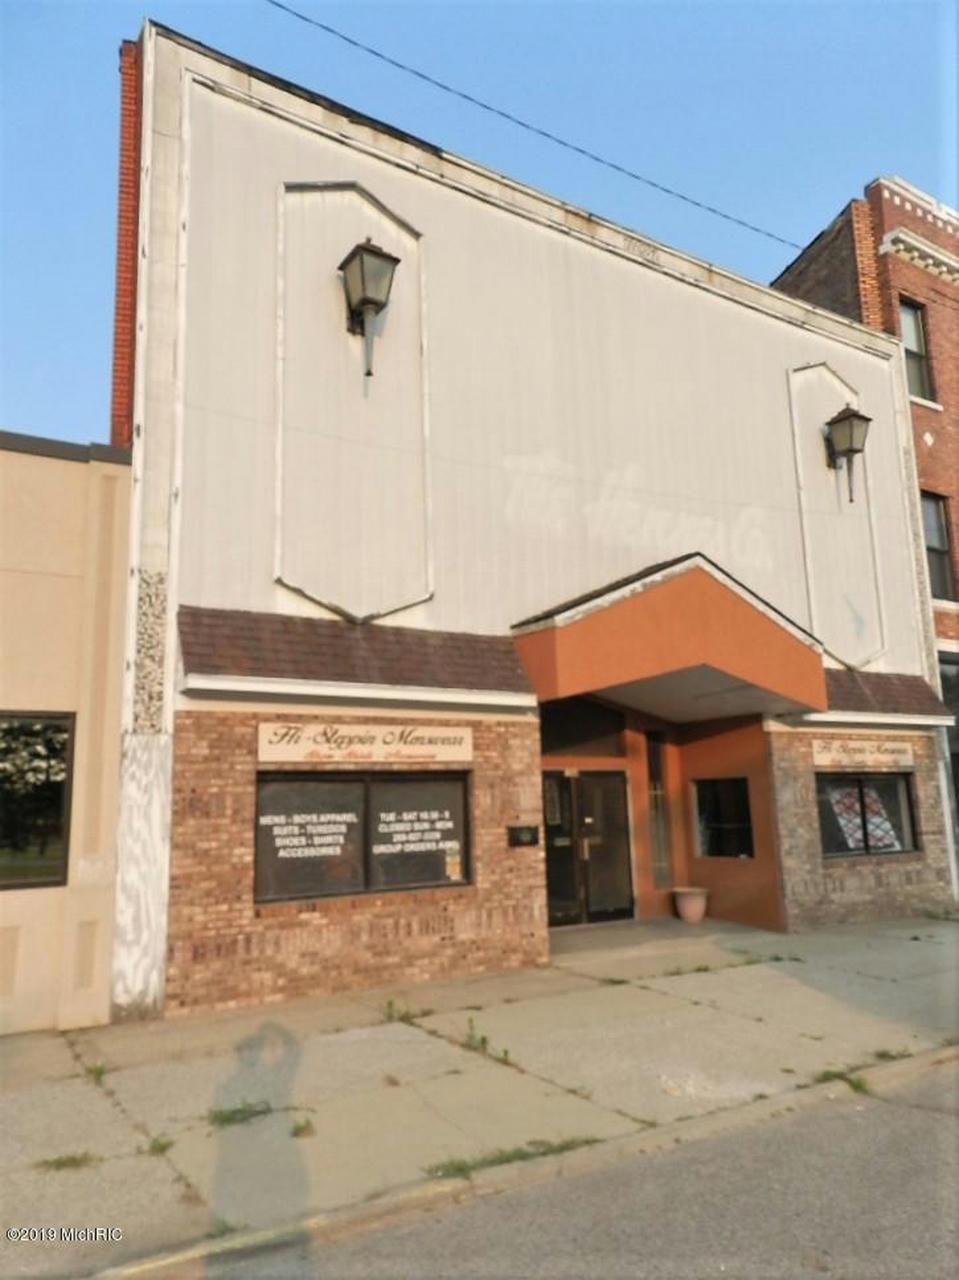 136 Pipestone St Benton Harbor, MI 49022